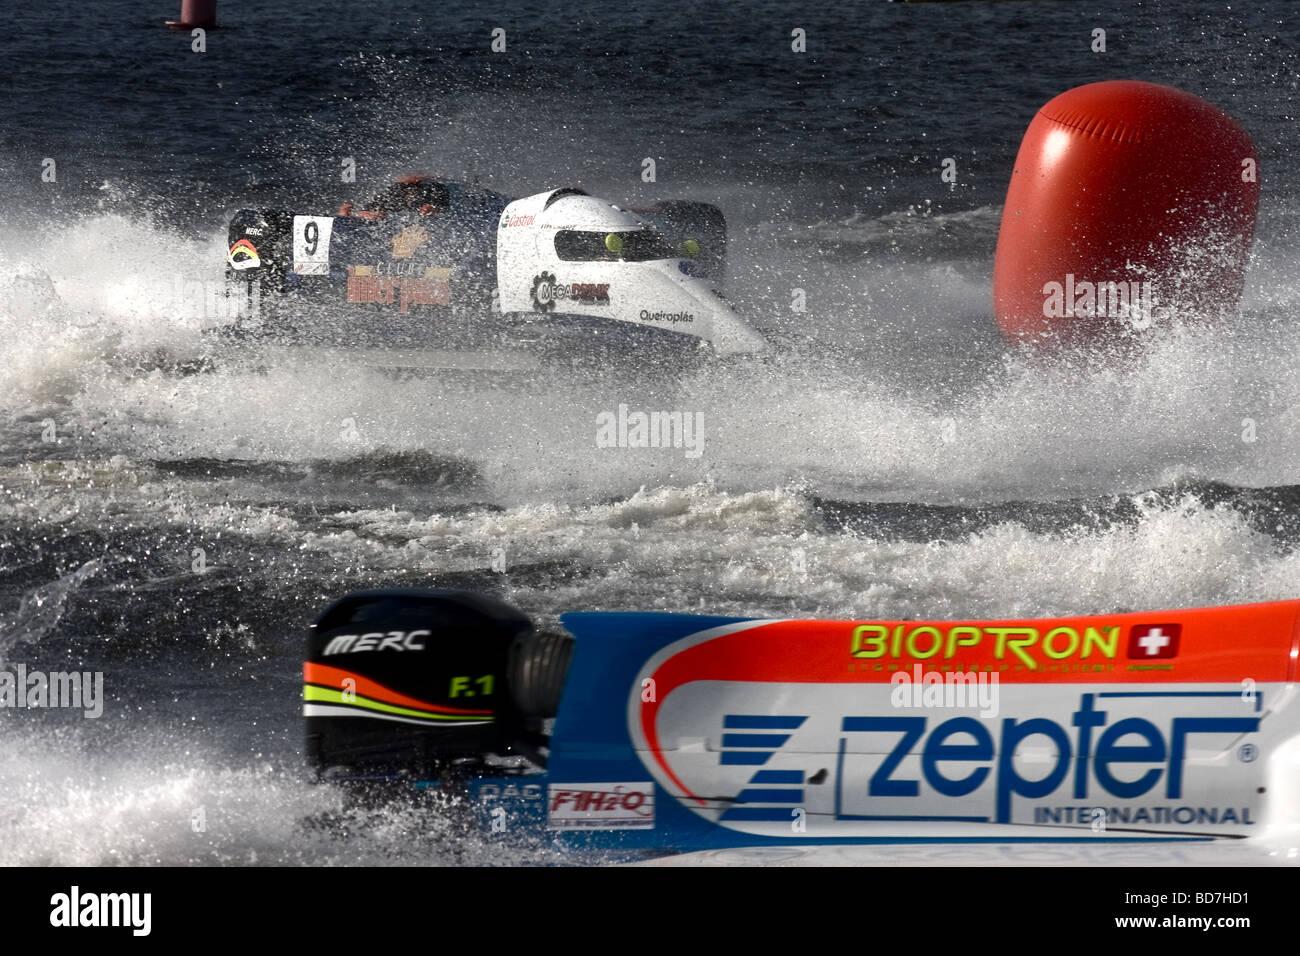 Formula 1 Powerboat World Championship 2009 St.Petersburg Russia - Stock Image